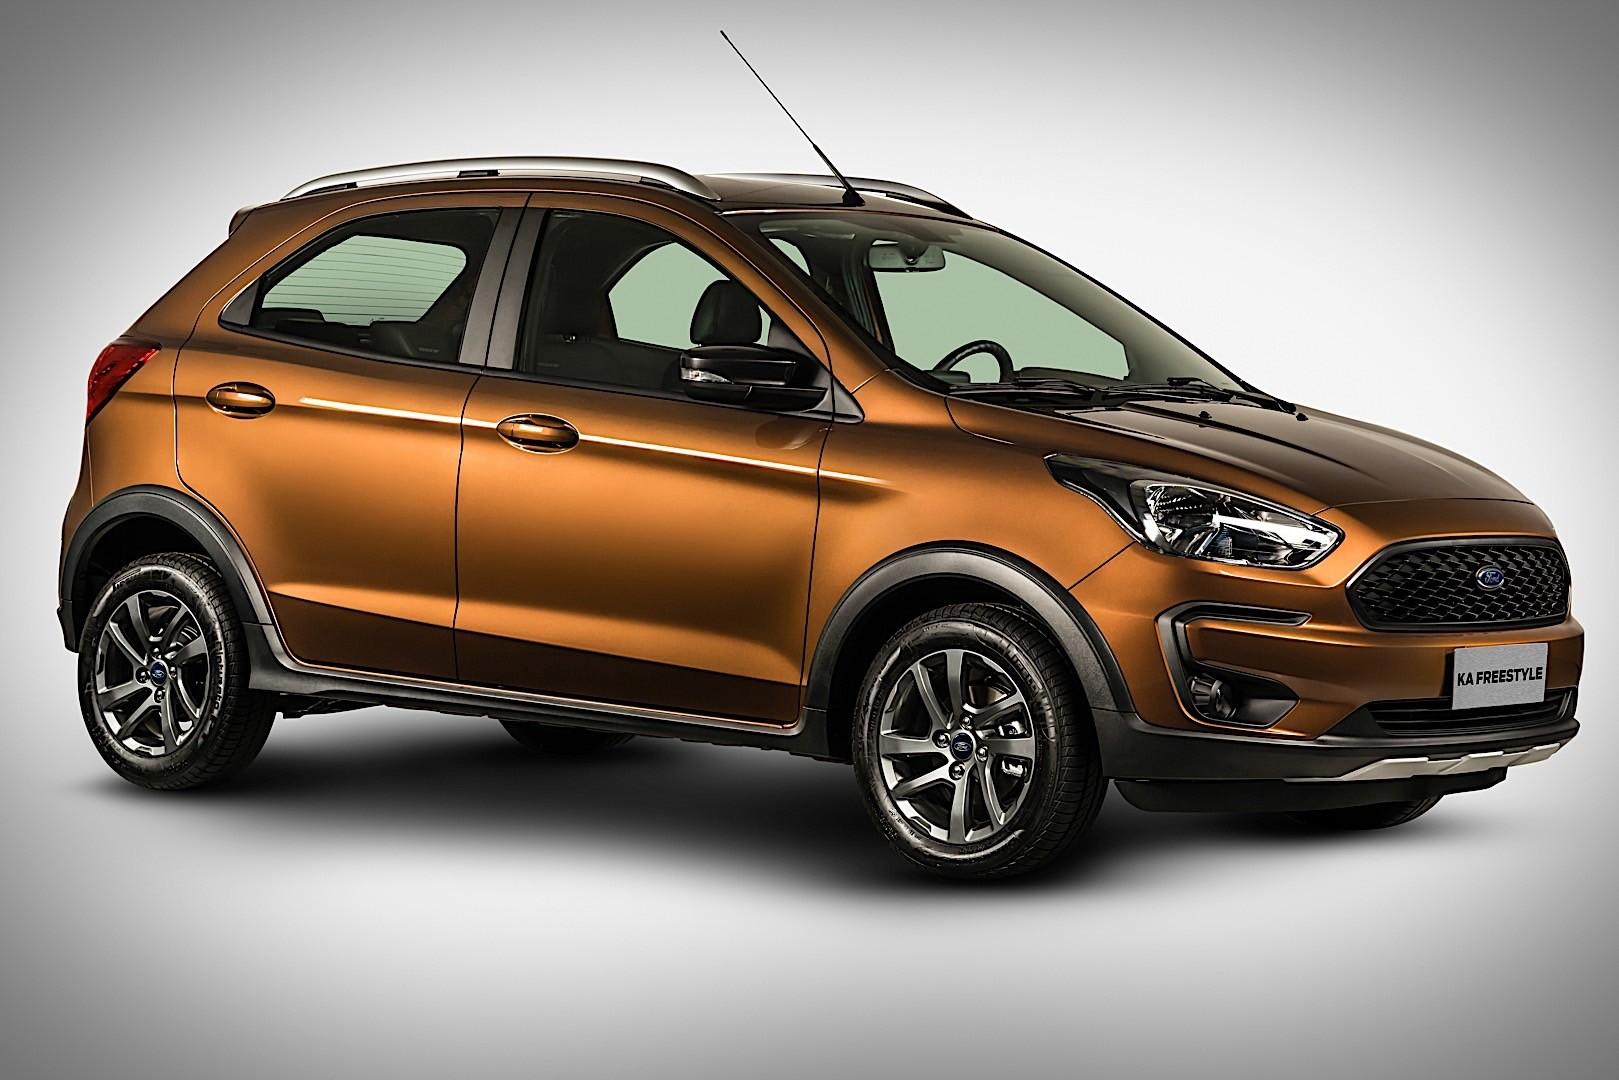 Bmw Concept Car Wallpaper Ford Ka Active Oficjalnie Namasce